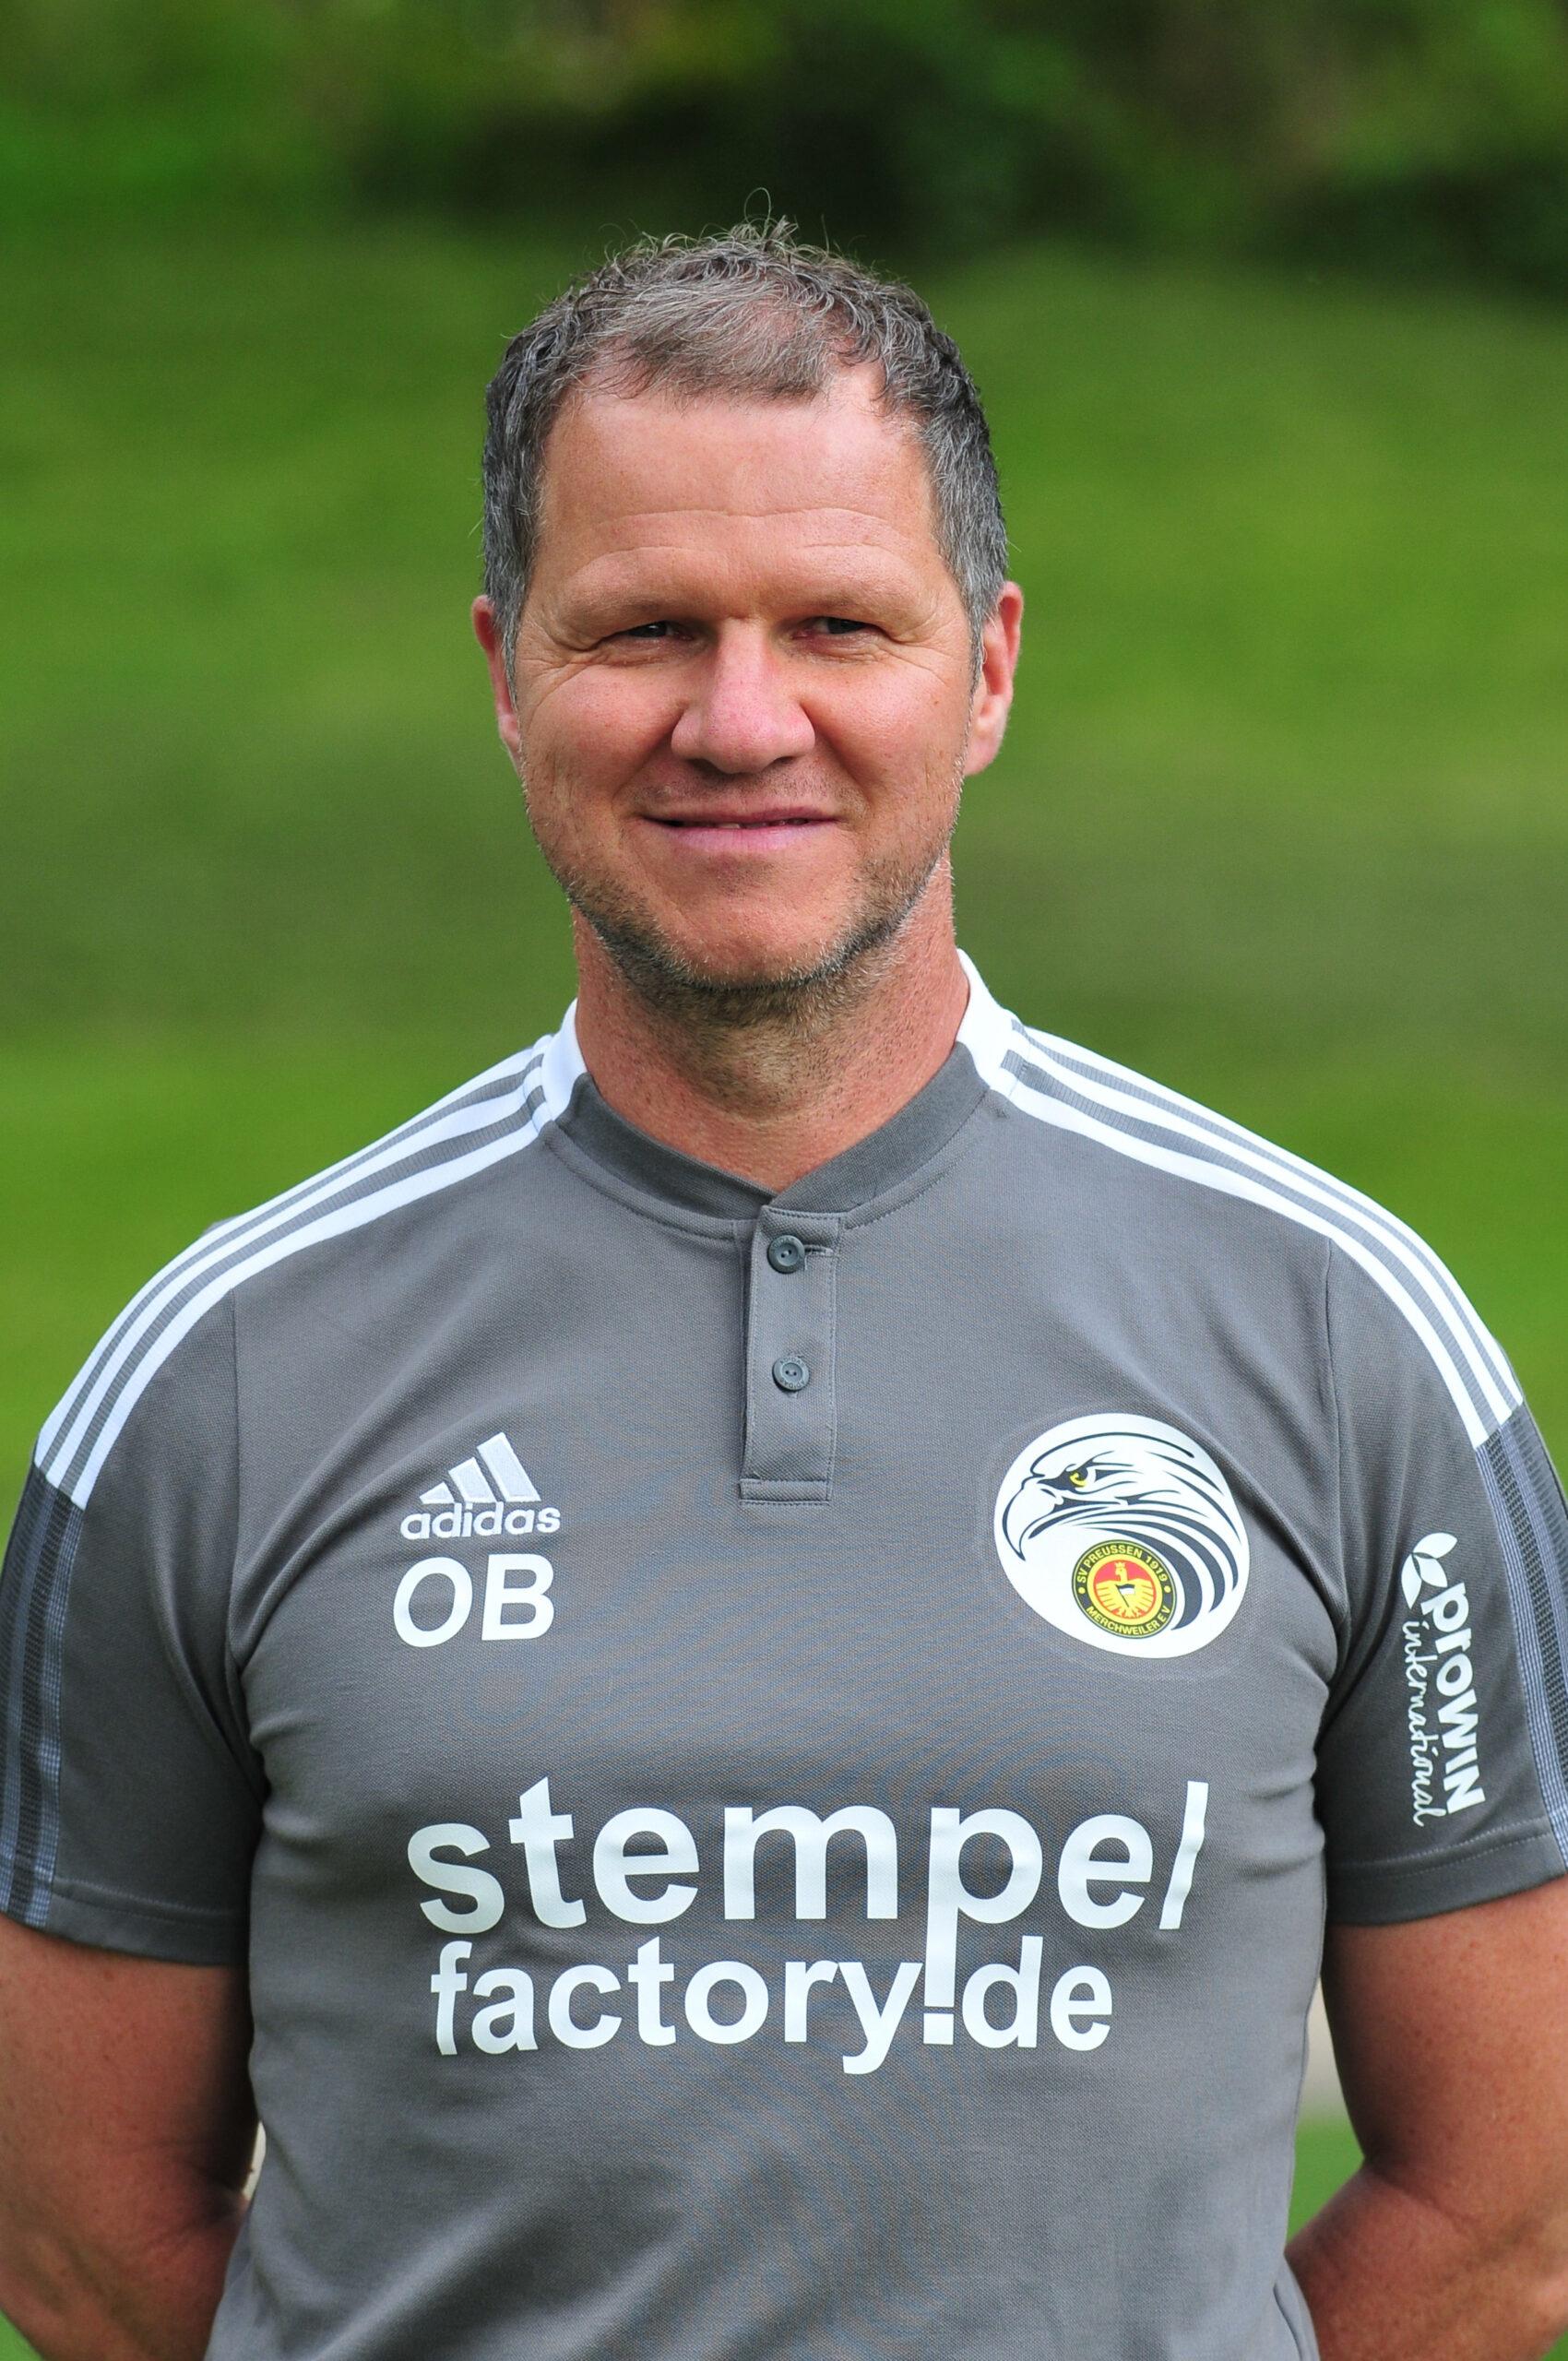 Oliver Braue